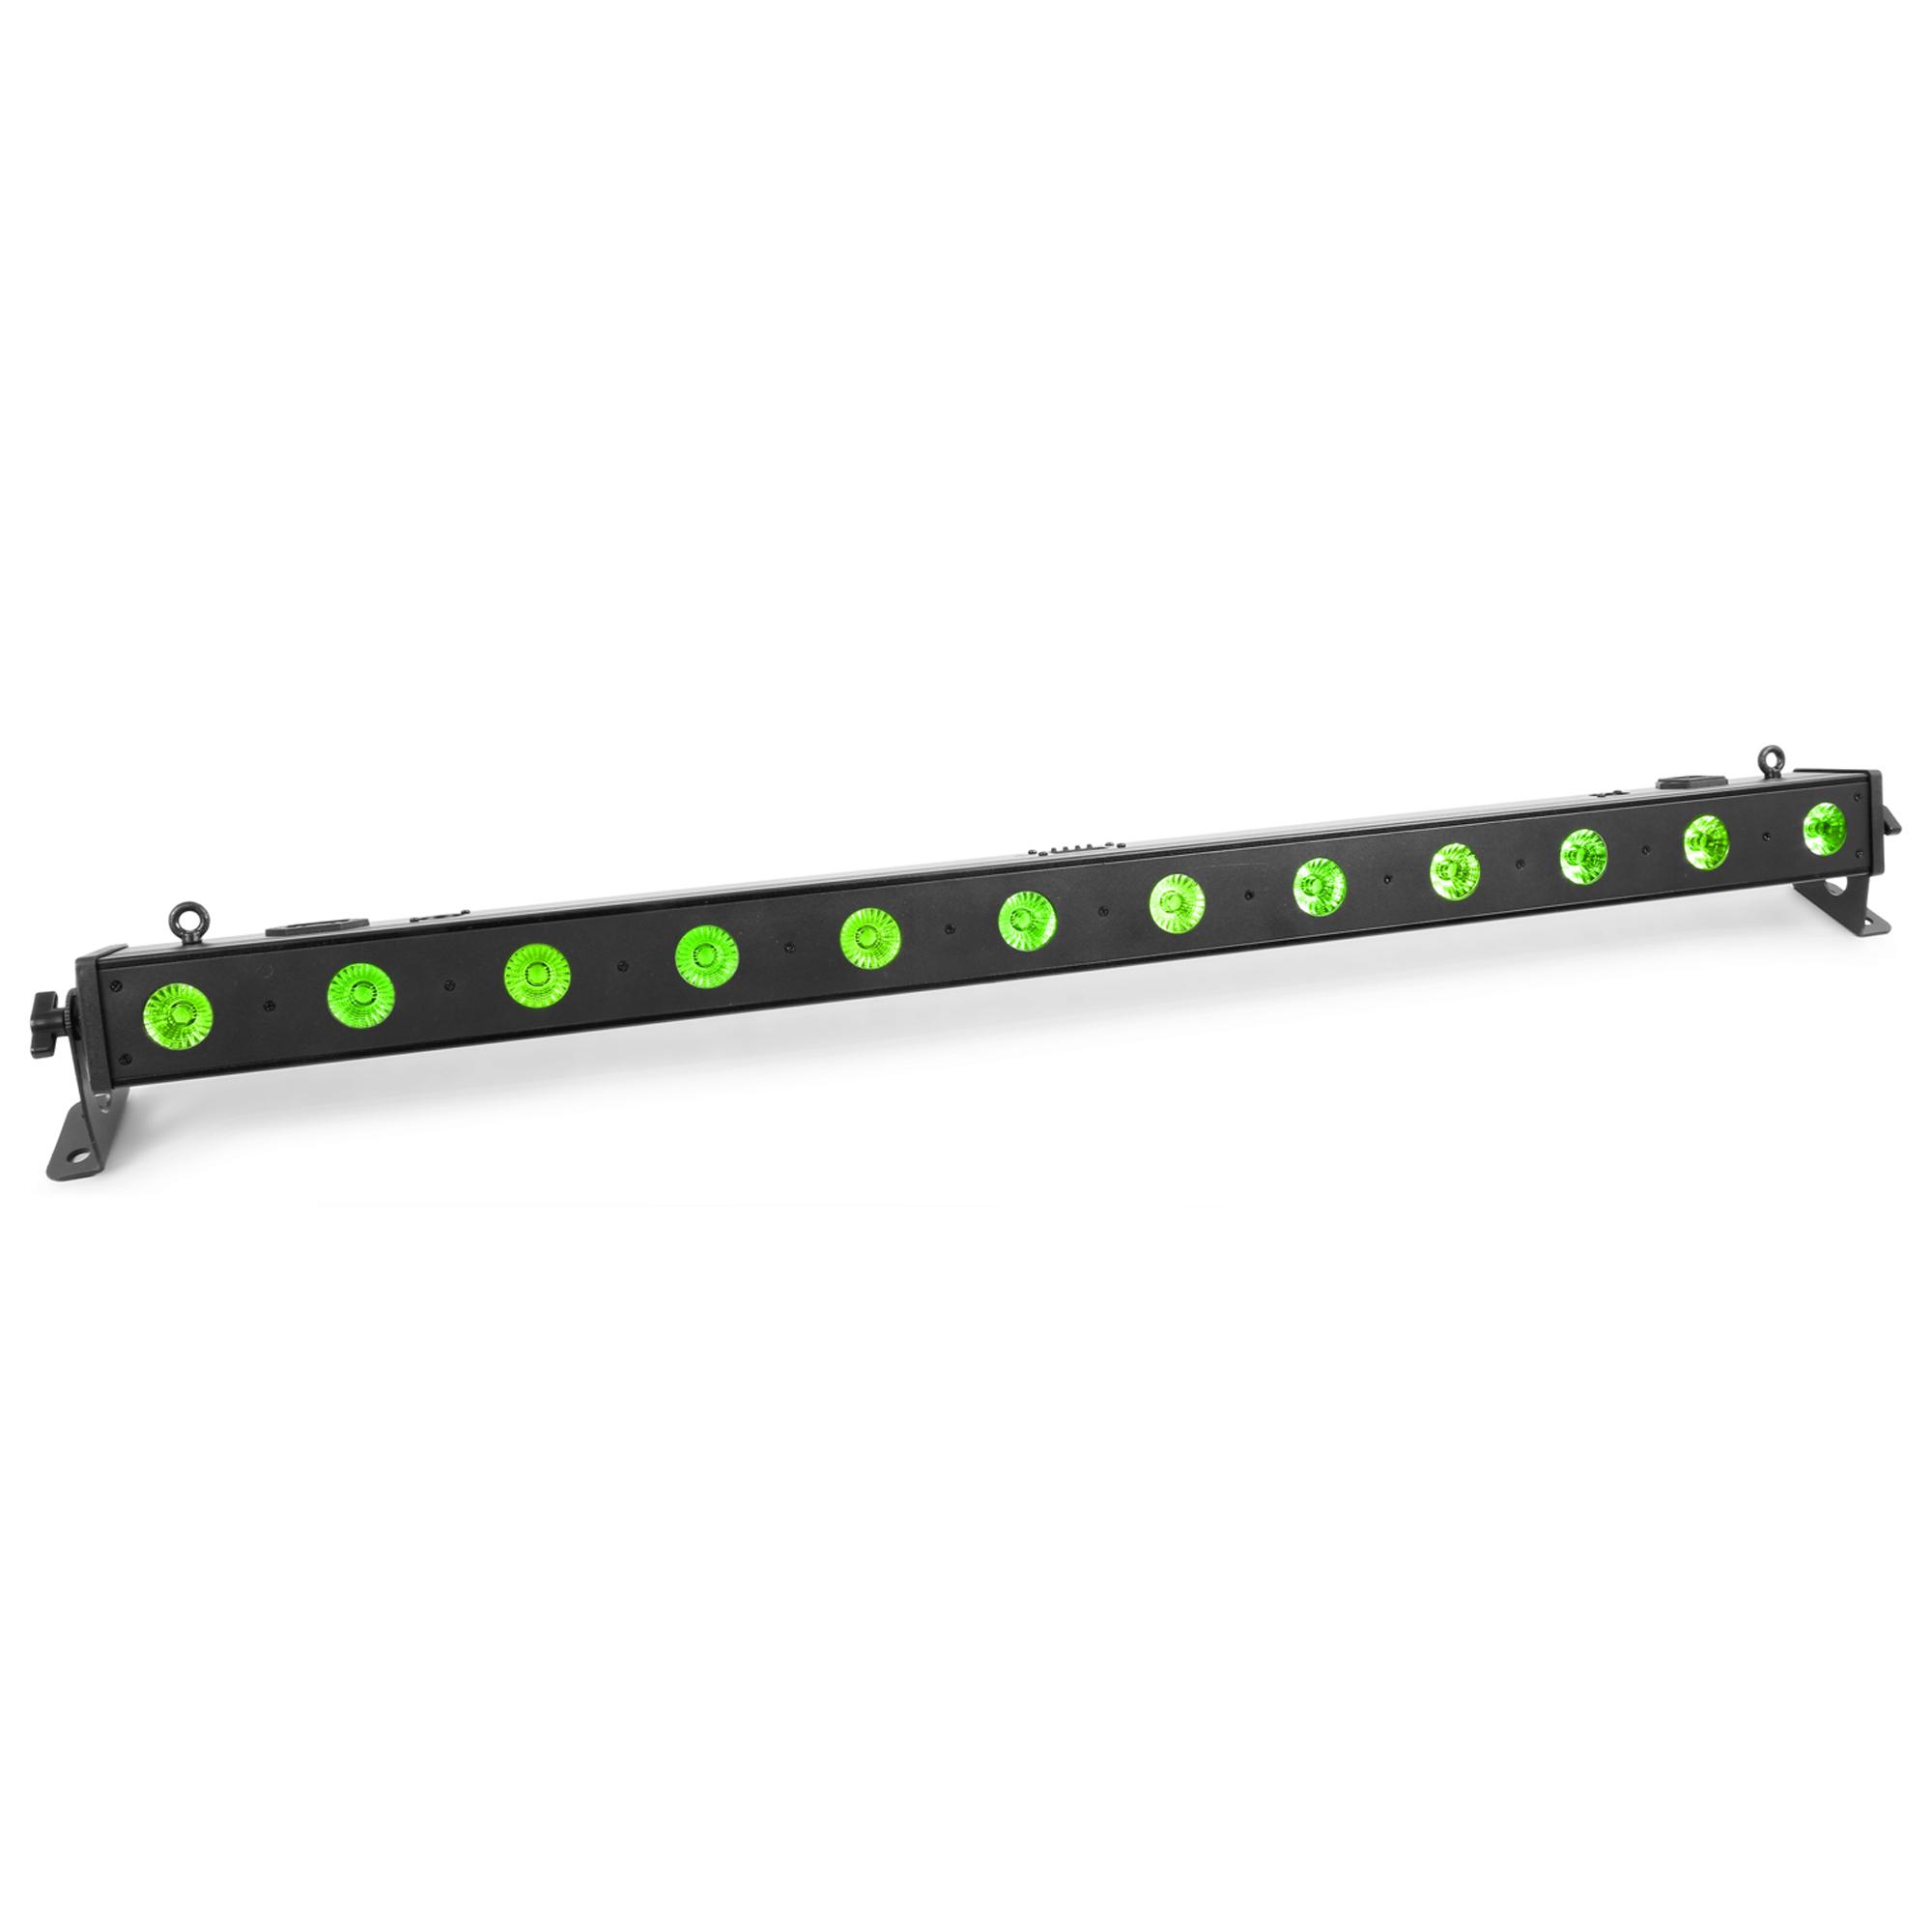 BeamZ LCB140 LED Light Bar, 1m